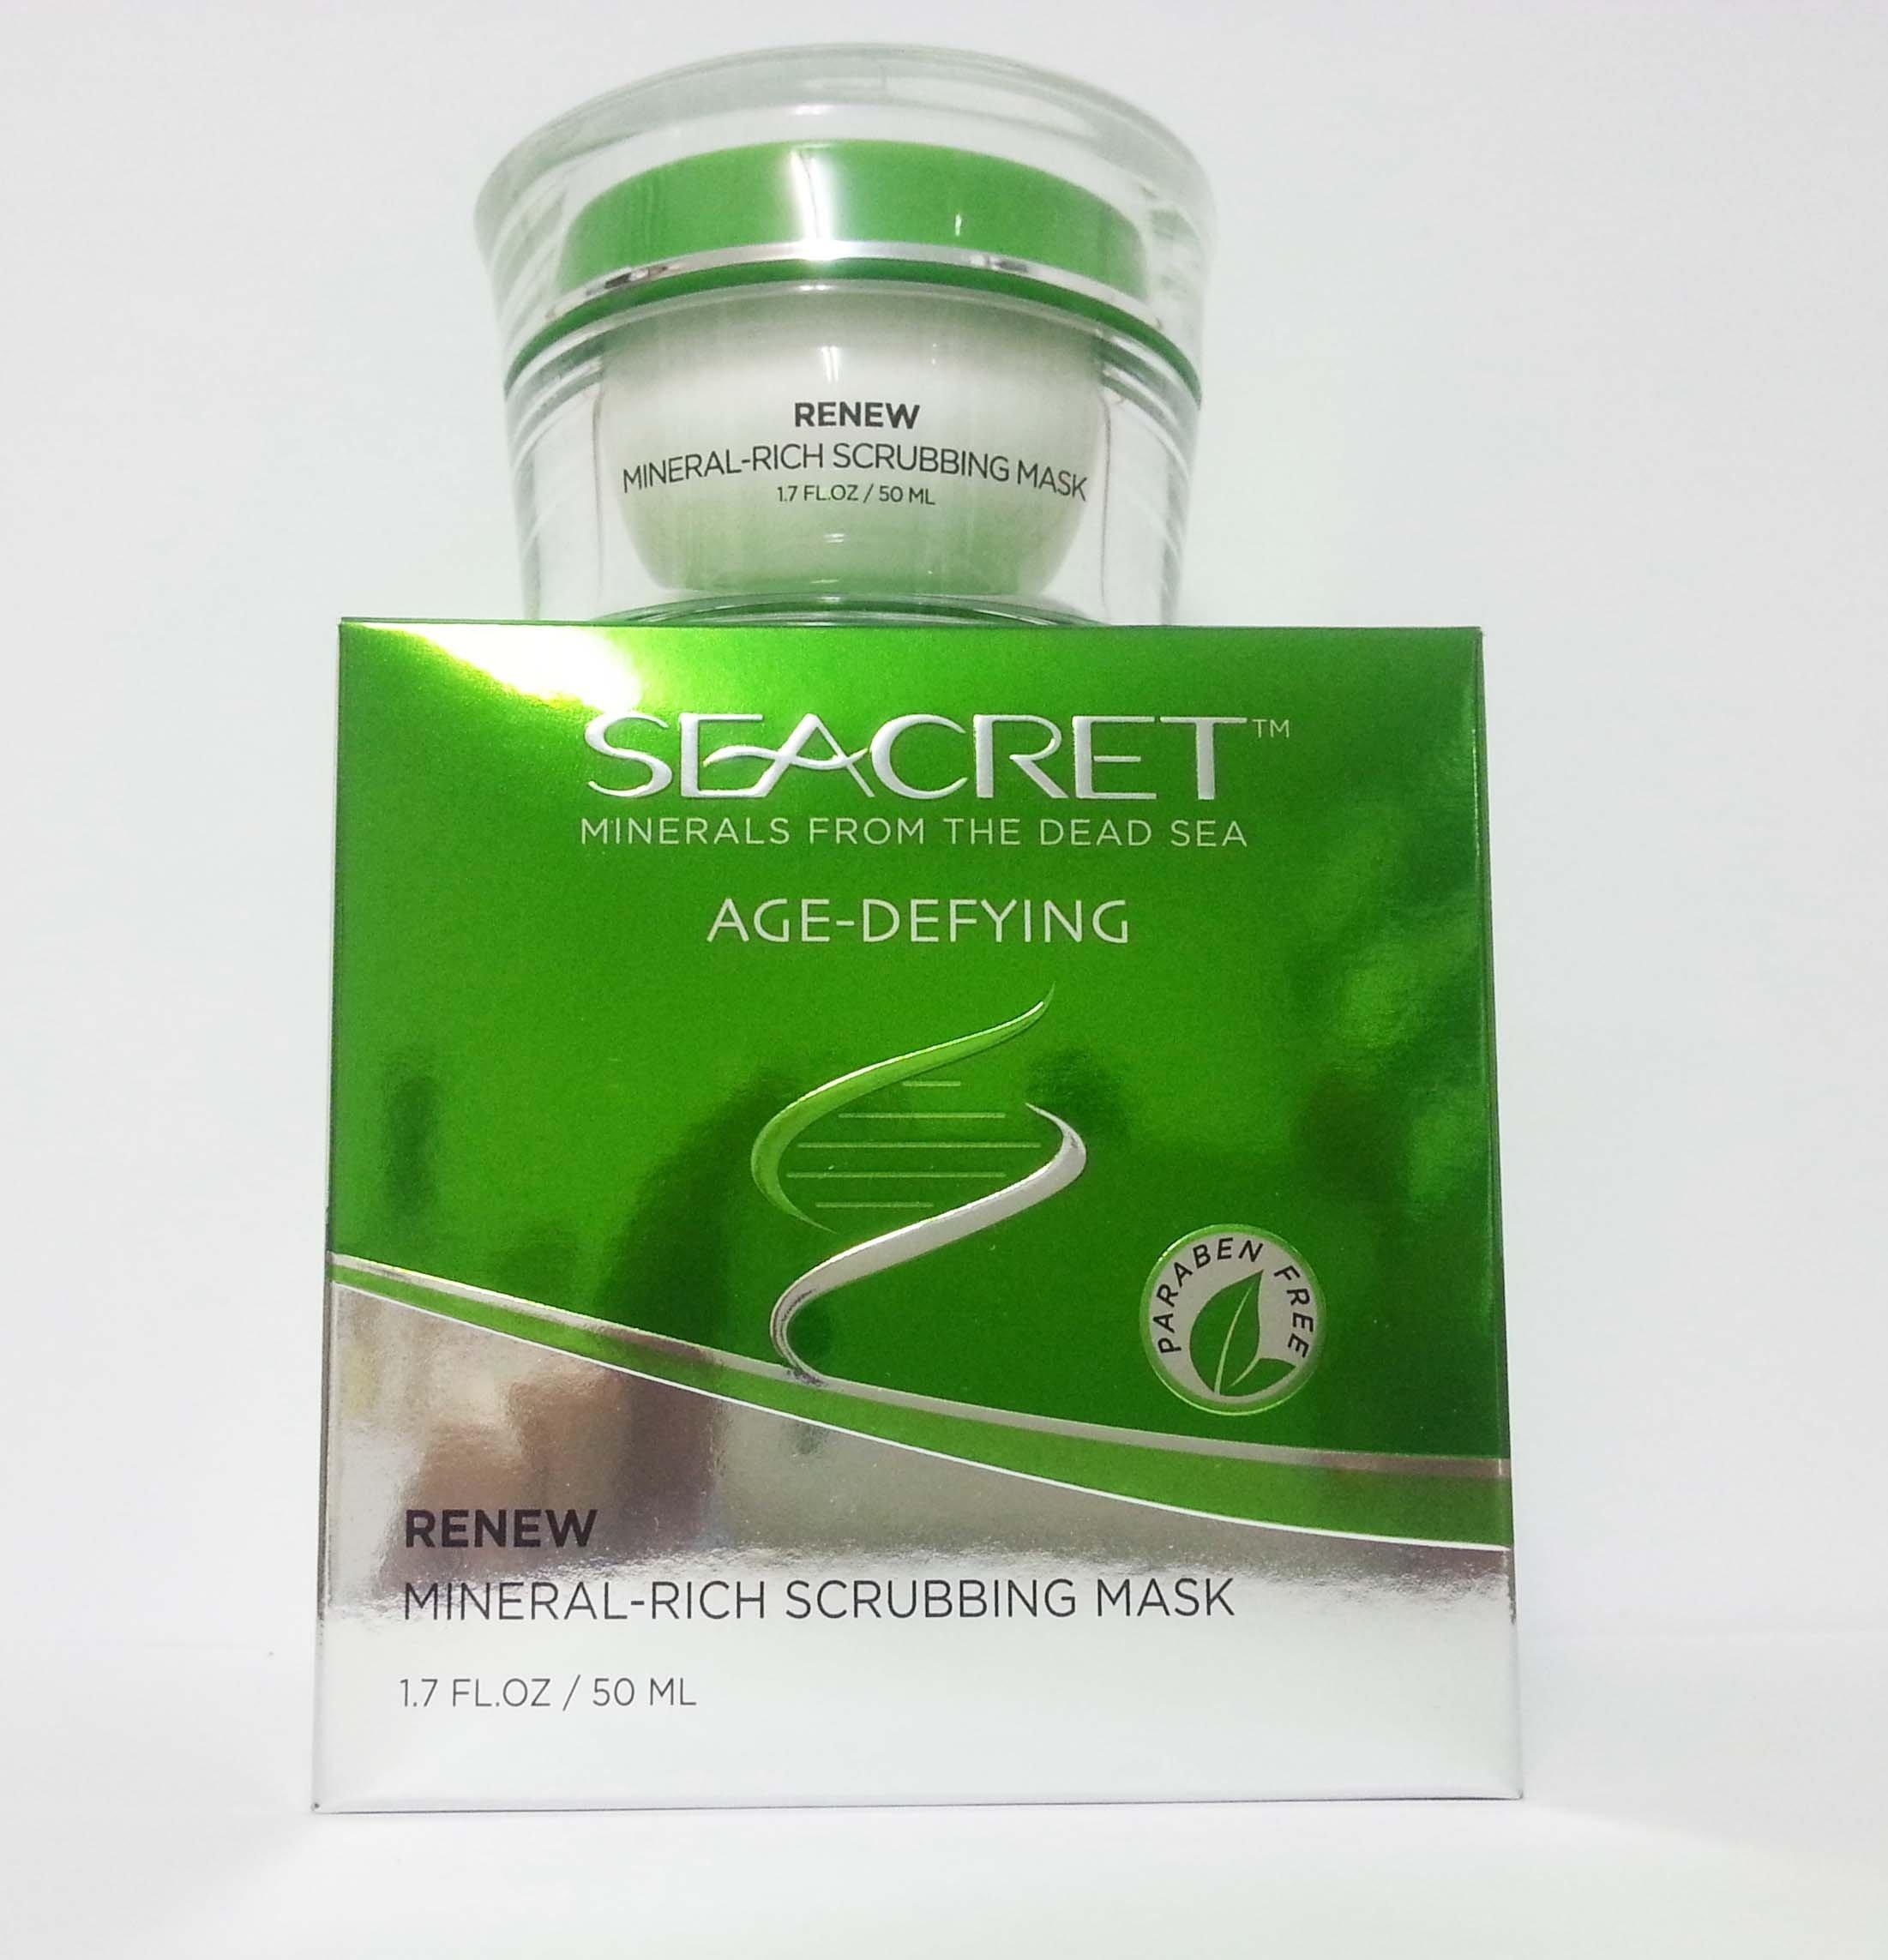 Seacret Renew Mineral-Rich Scrubbing Mask